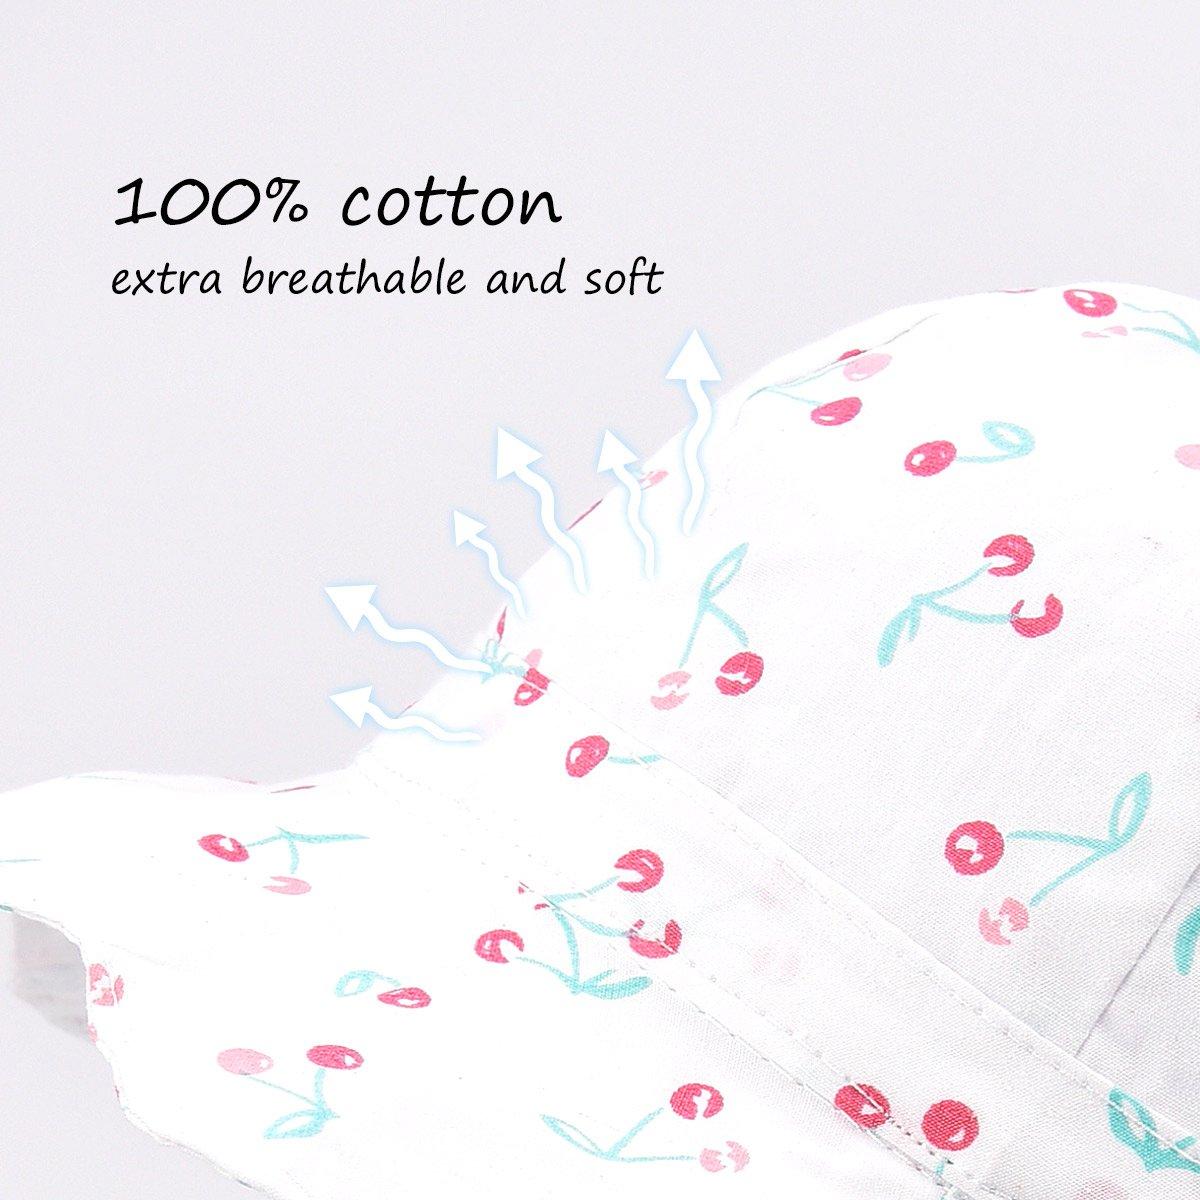 SOMALER Baby Girls Summer Sun Hat Toddler Kids Spring Lightweight Foldable Cotton Cap by SOMALER (Image #3)